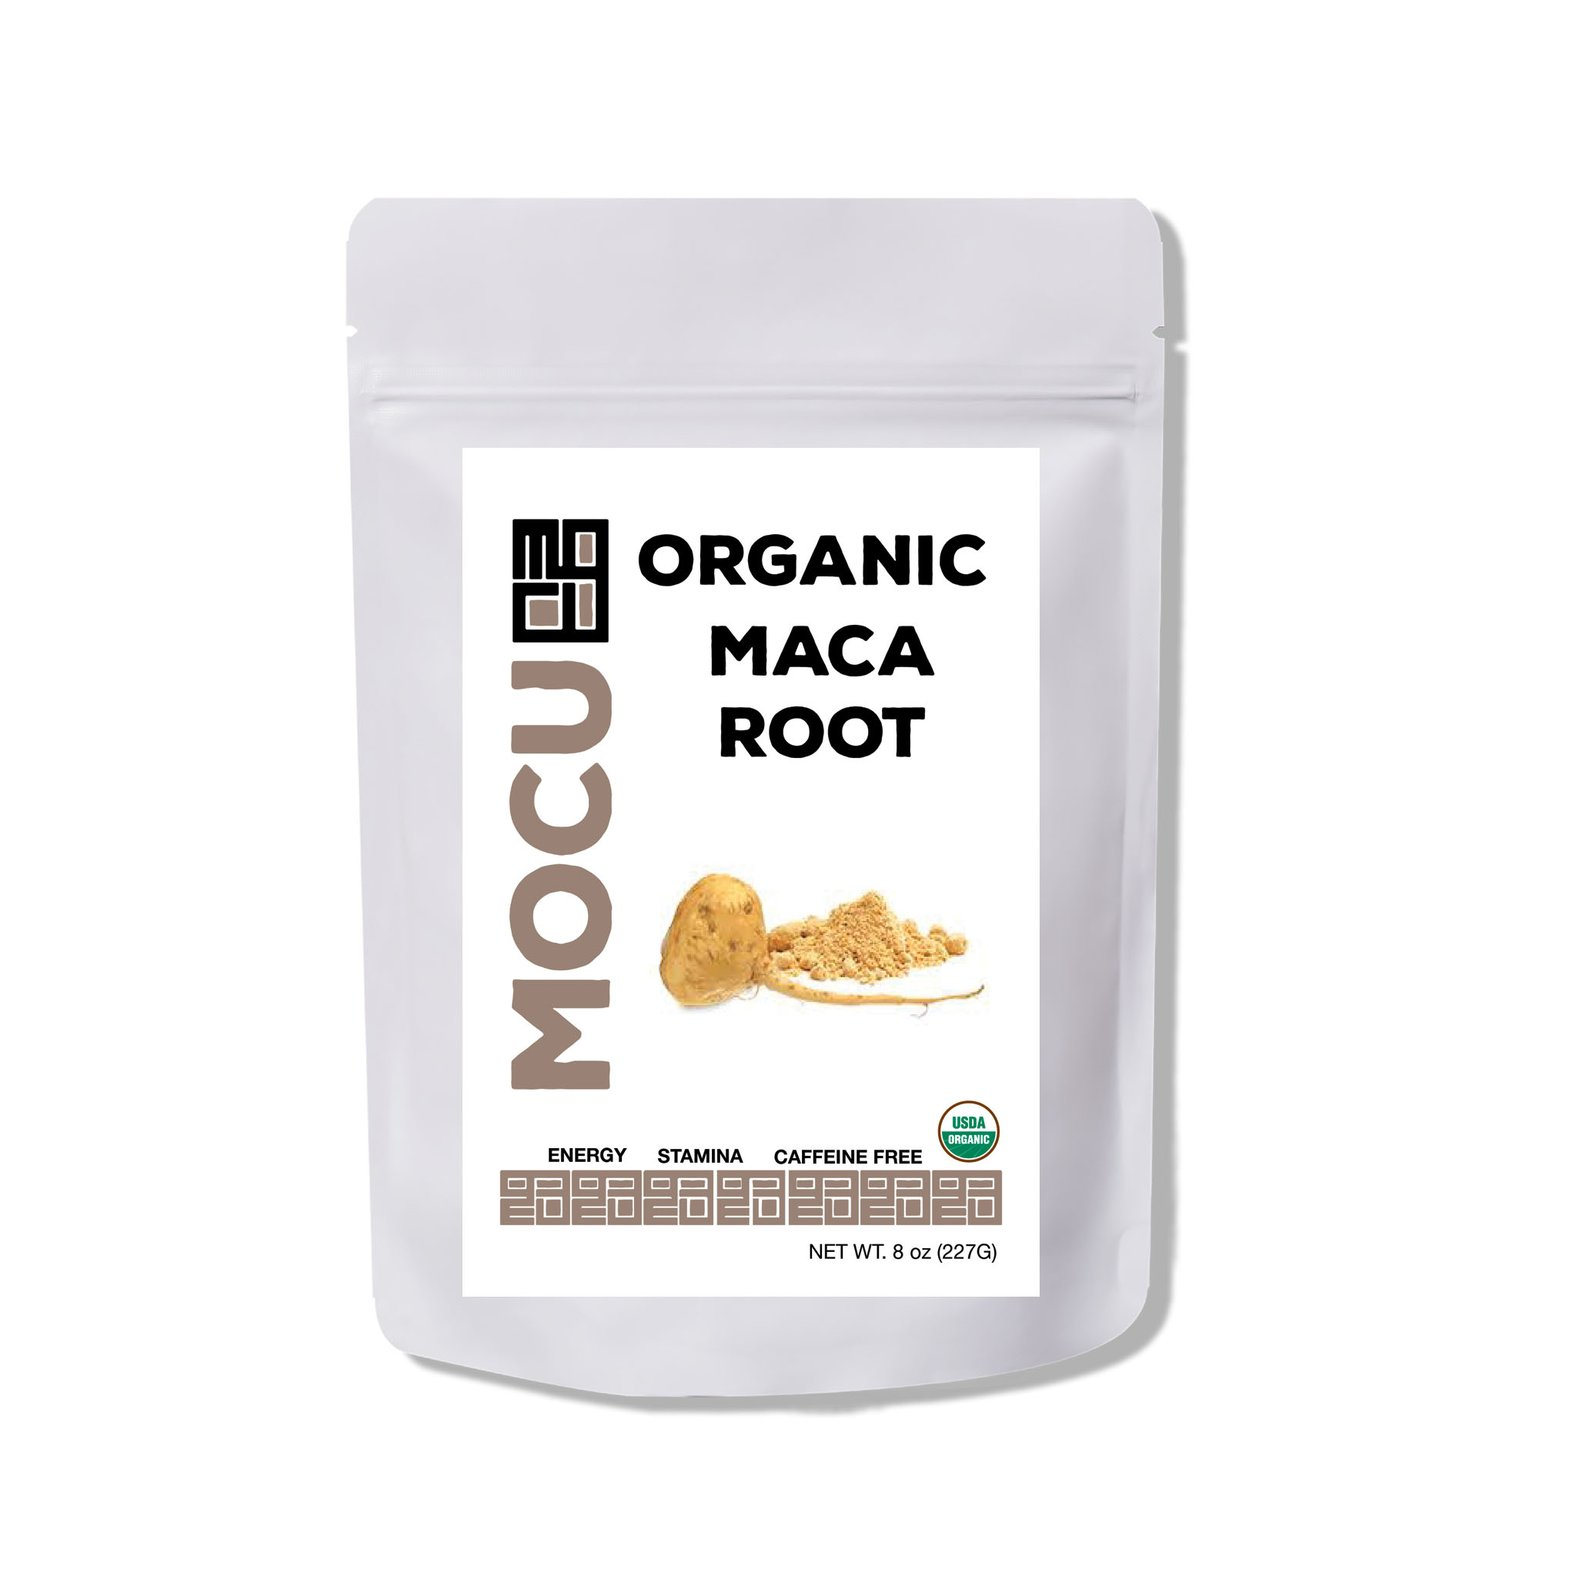 mocu-organic-maca-root-powder-front.jpg